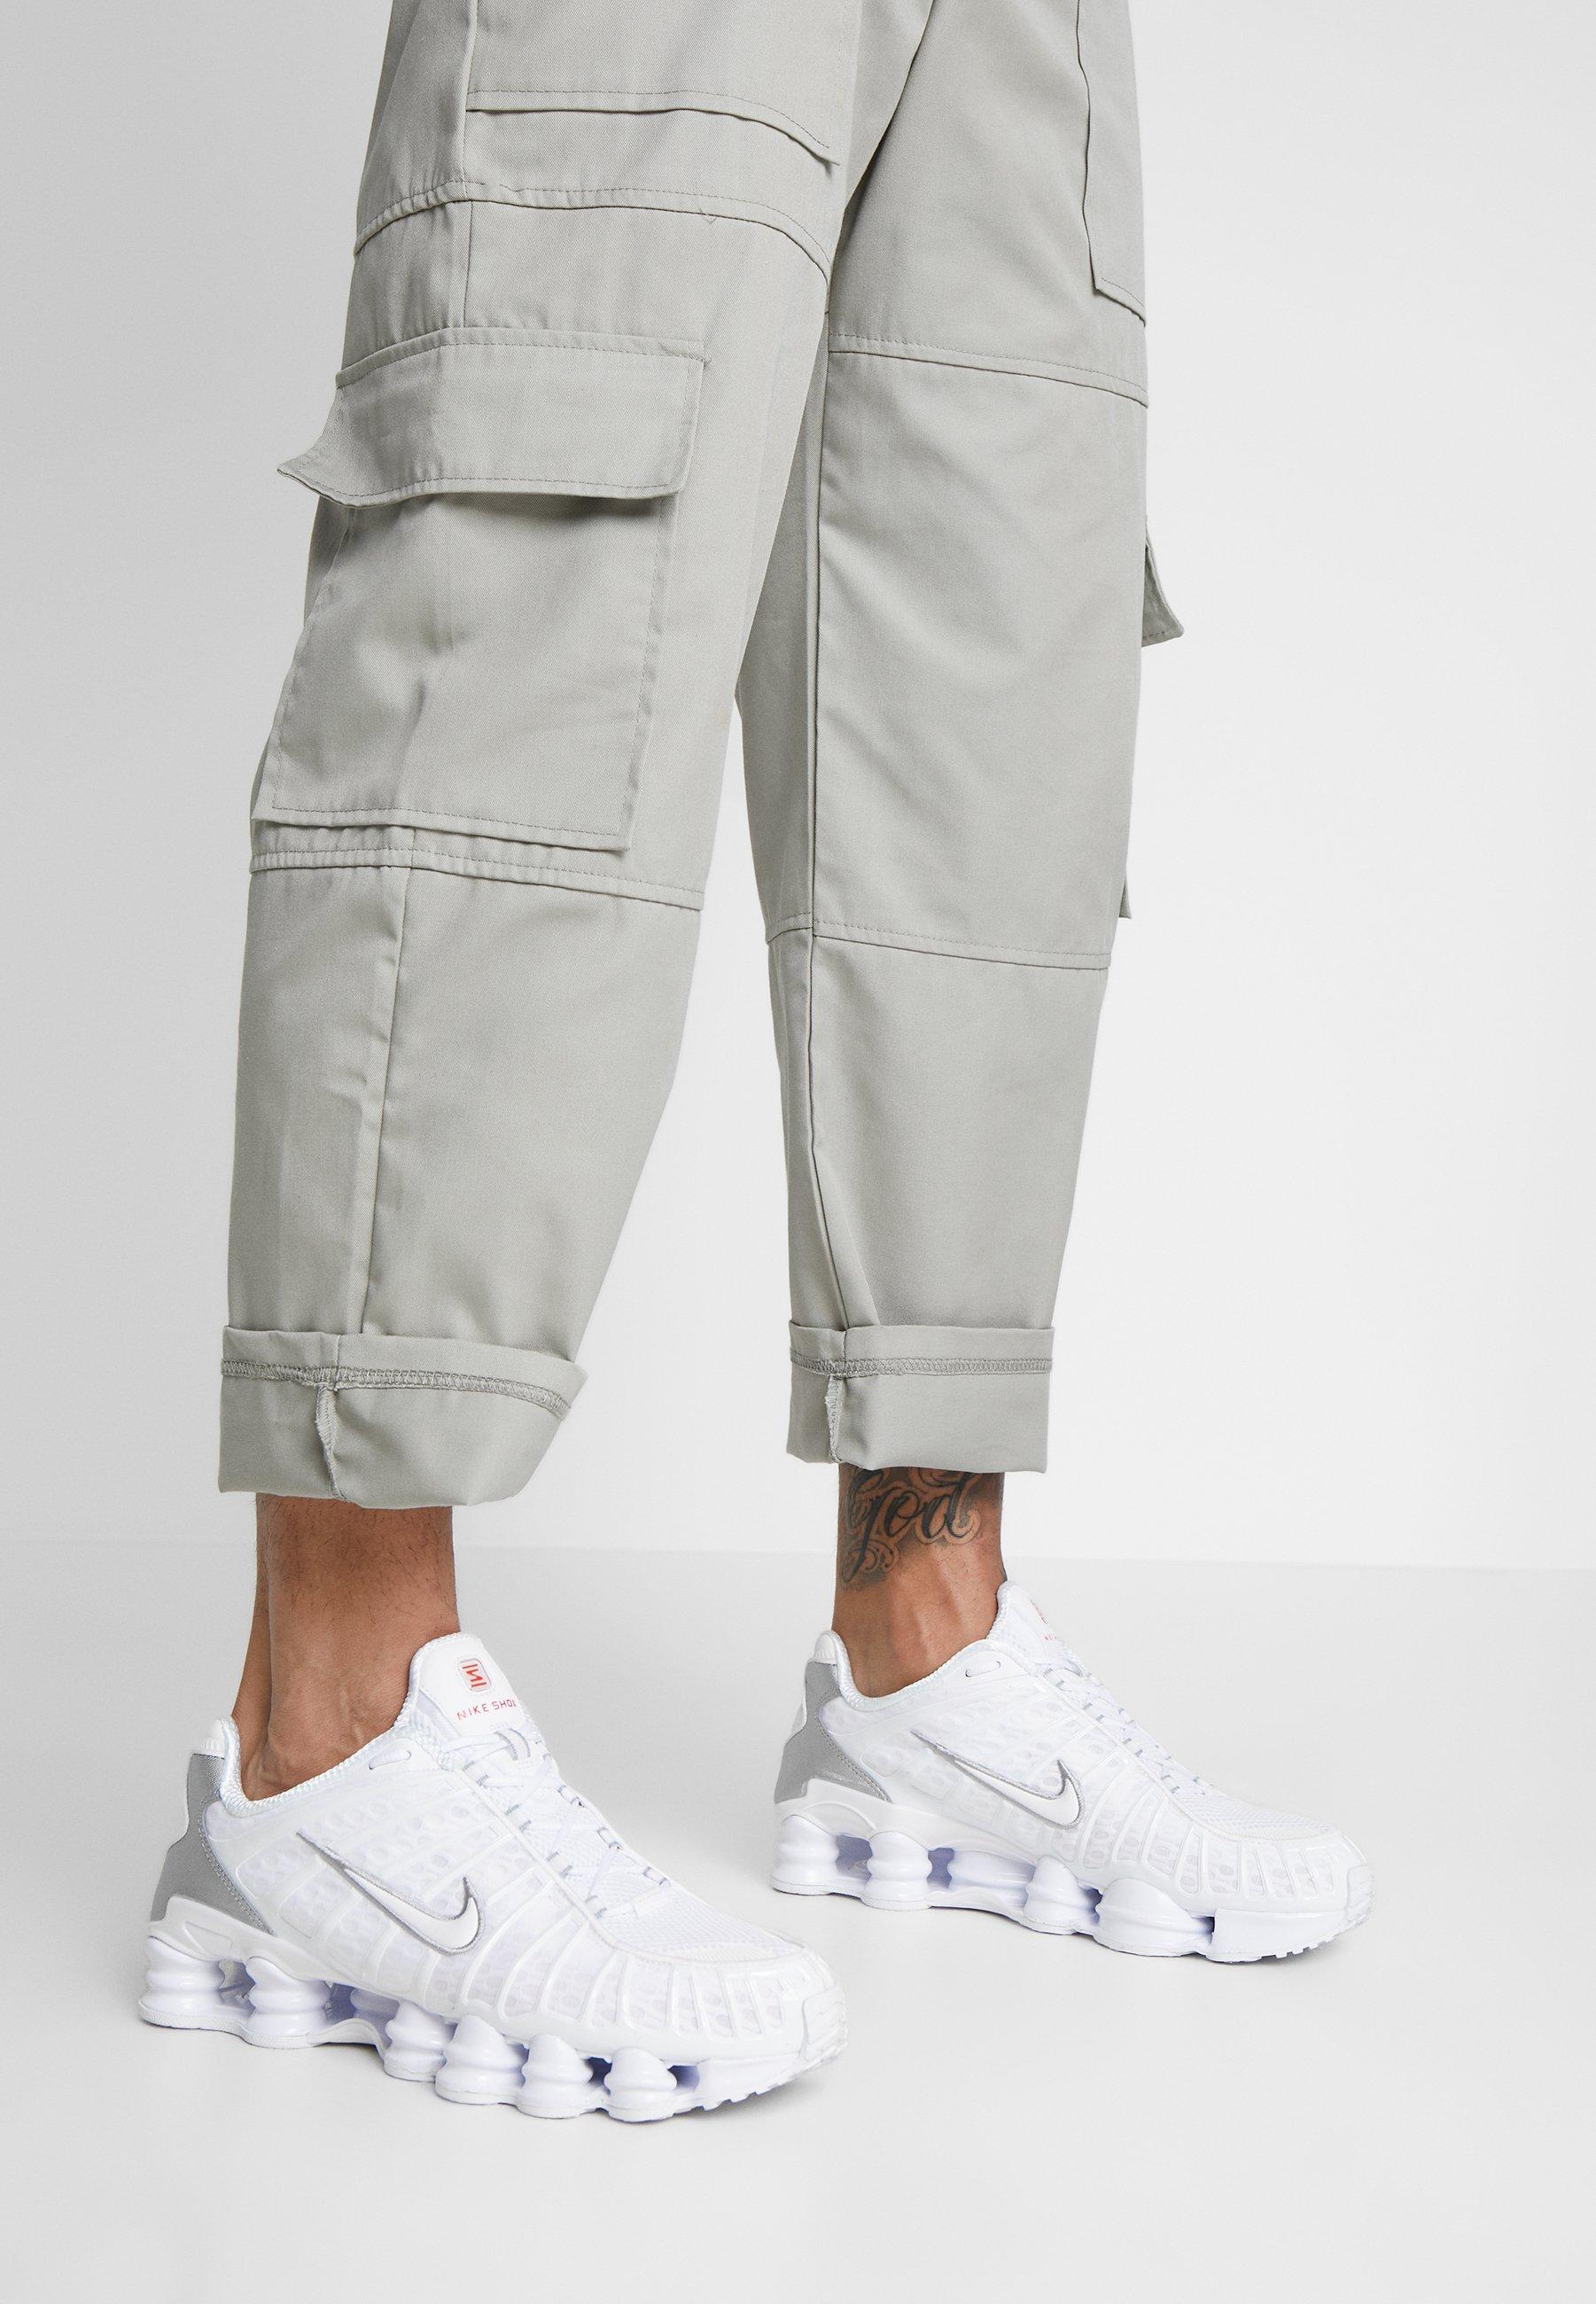 Nike Shox TL Herrenschuh Sneakers basse whitemetallic silvermax orange